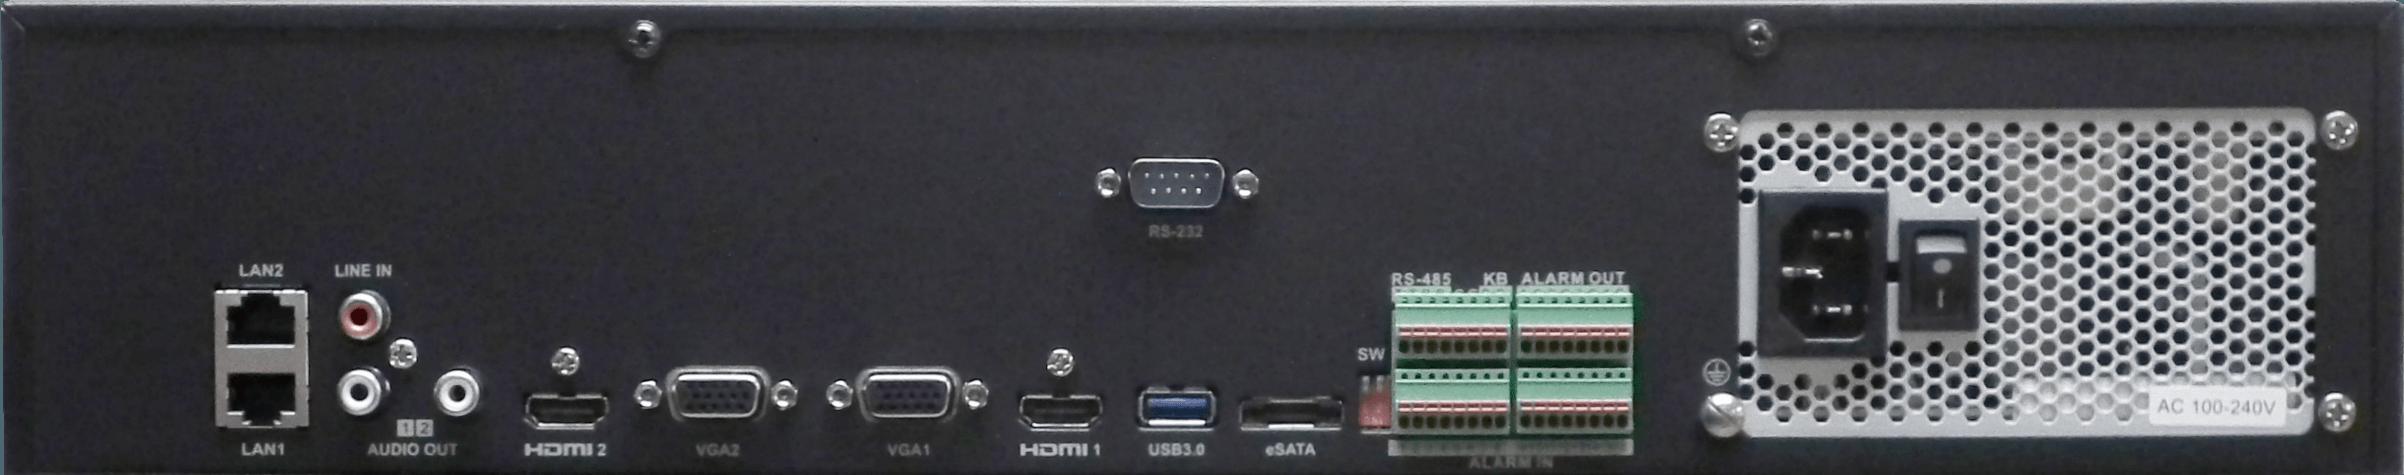 ds-9664ni-i8_rear